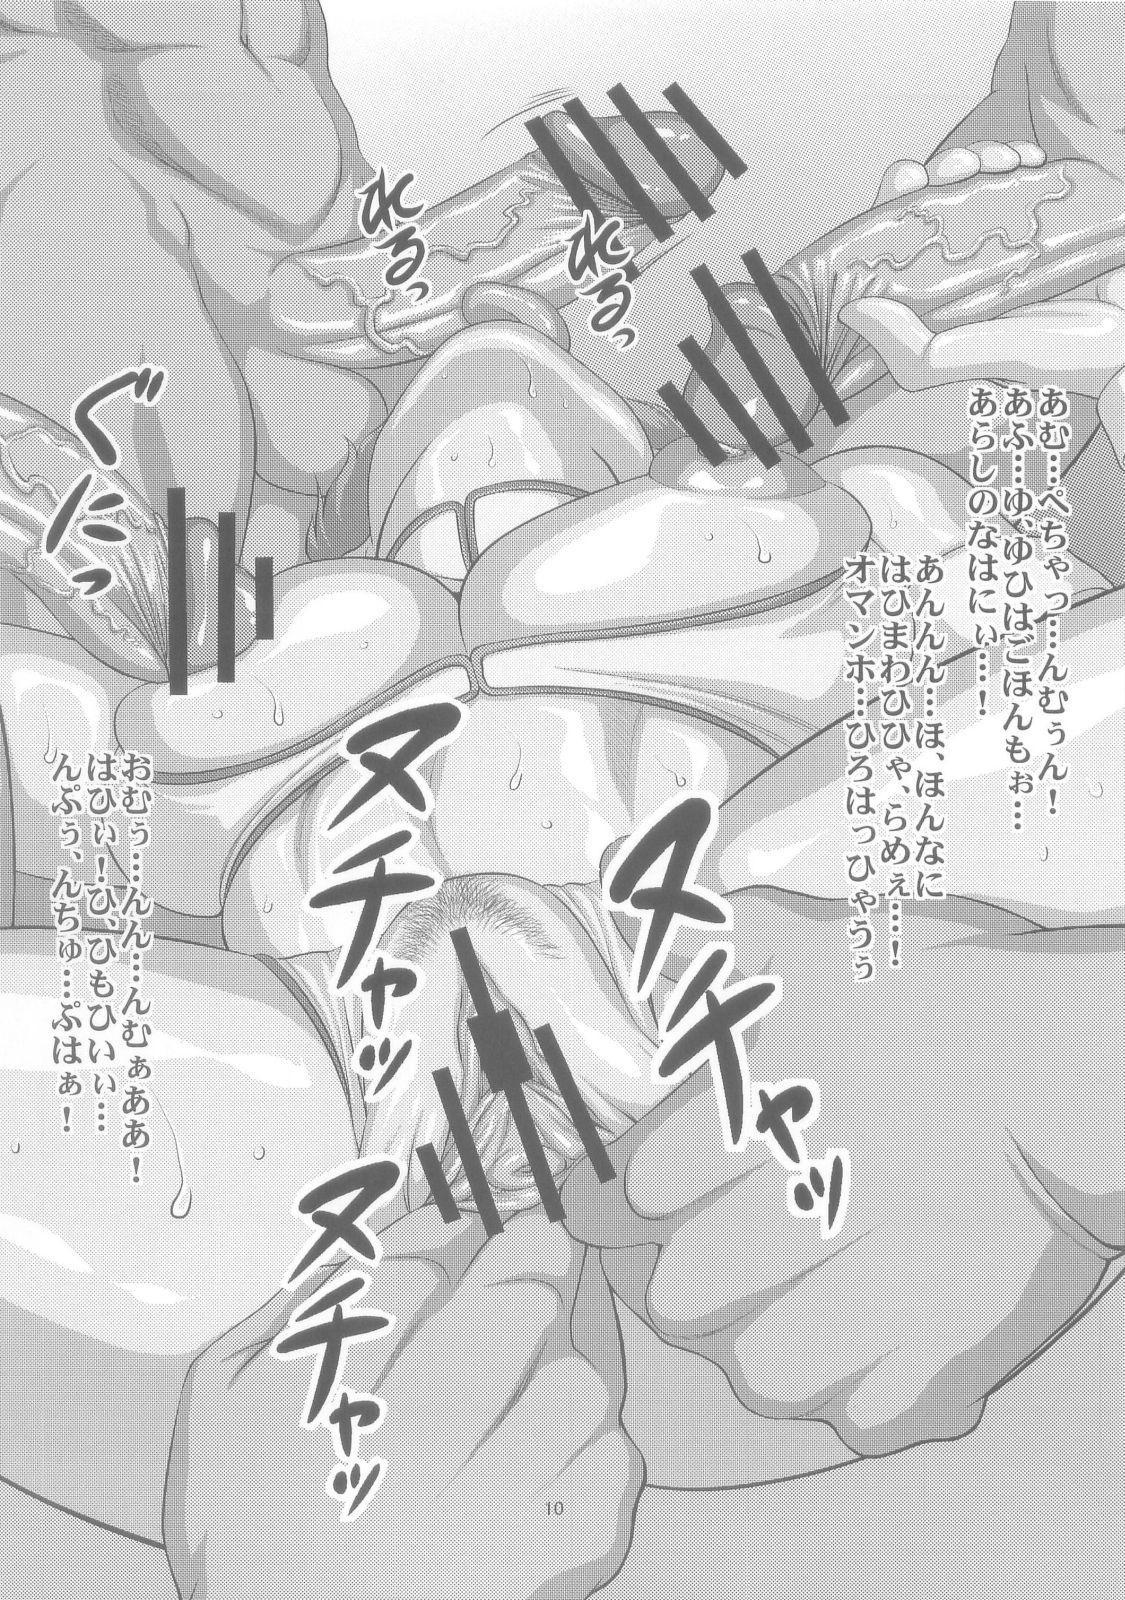 (C83) [Kikumizuan (Kikumizu Shouichi)] Lovely Erotics ~ K*i no Baai ~   Lovely Erotics -The Case of K*i- (Dirty Pair) 11